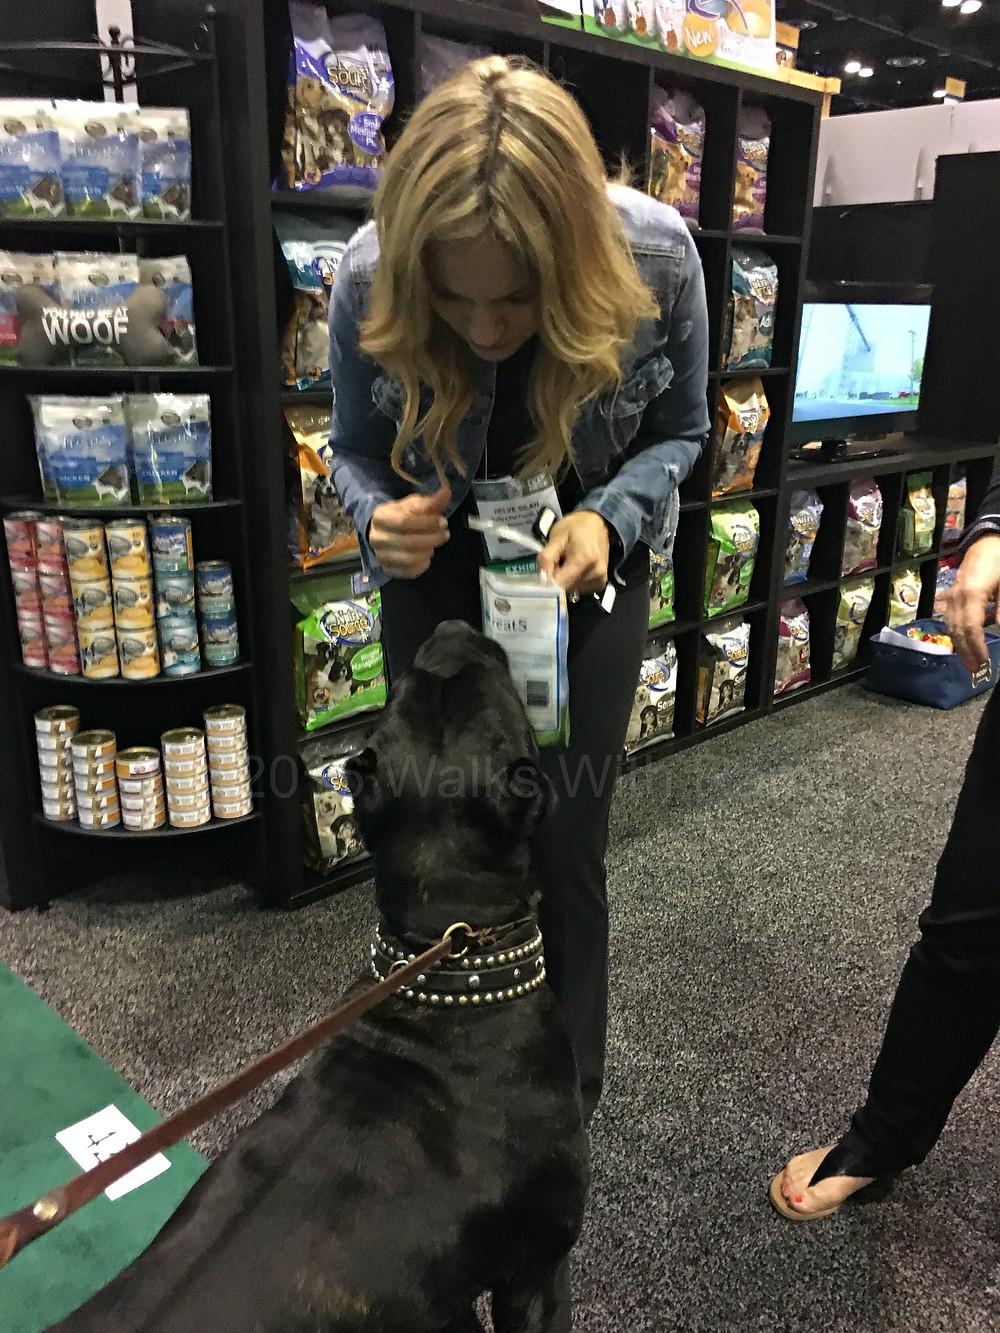 dog getting dog treats